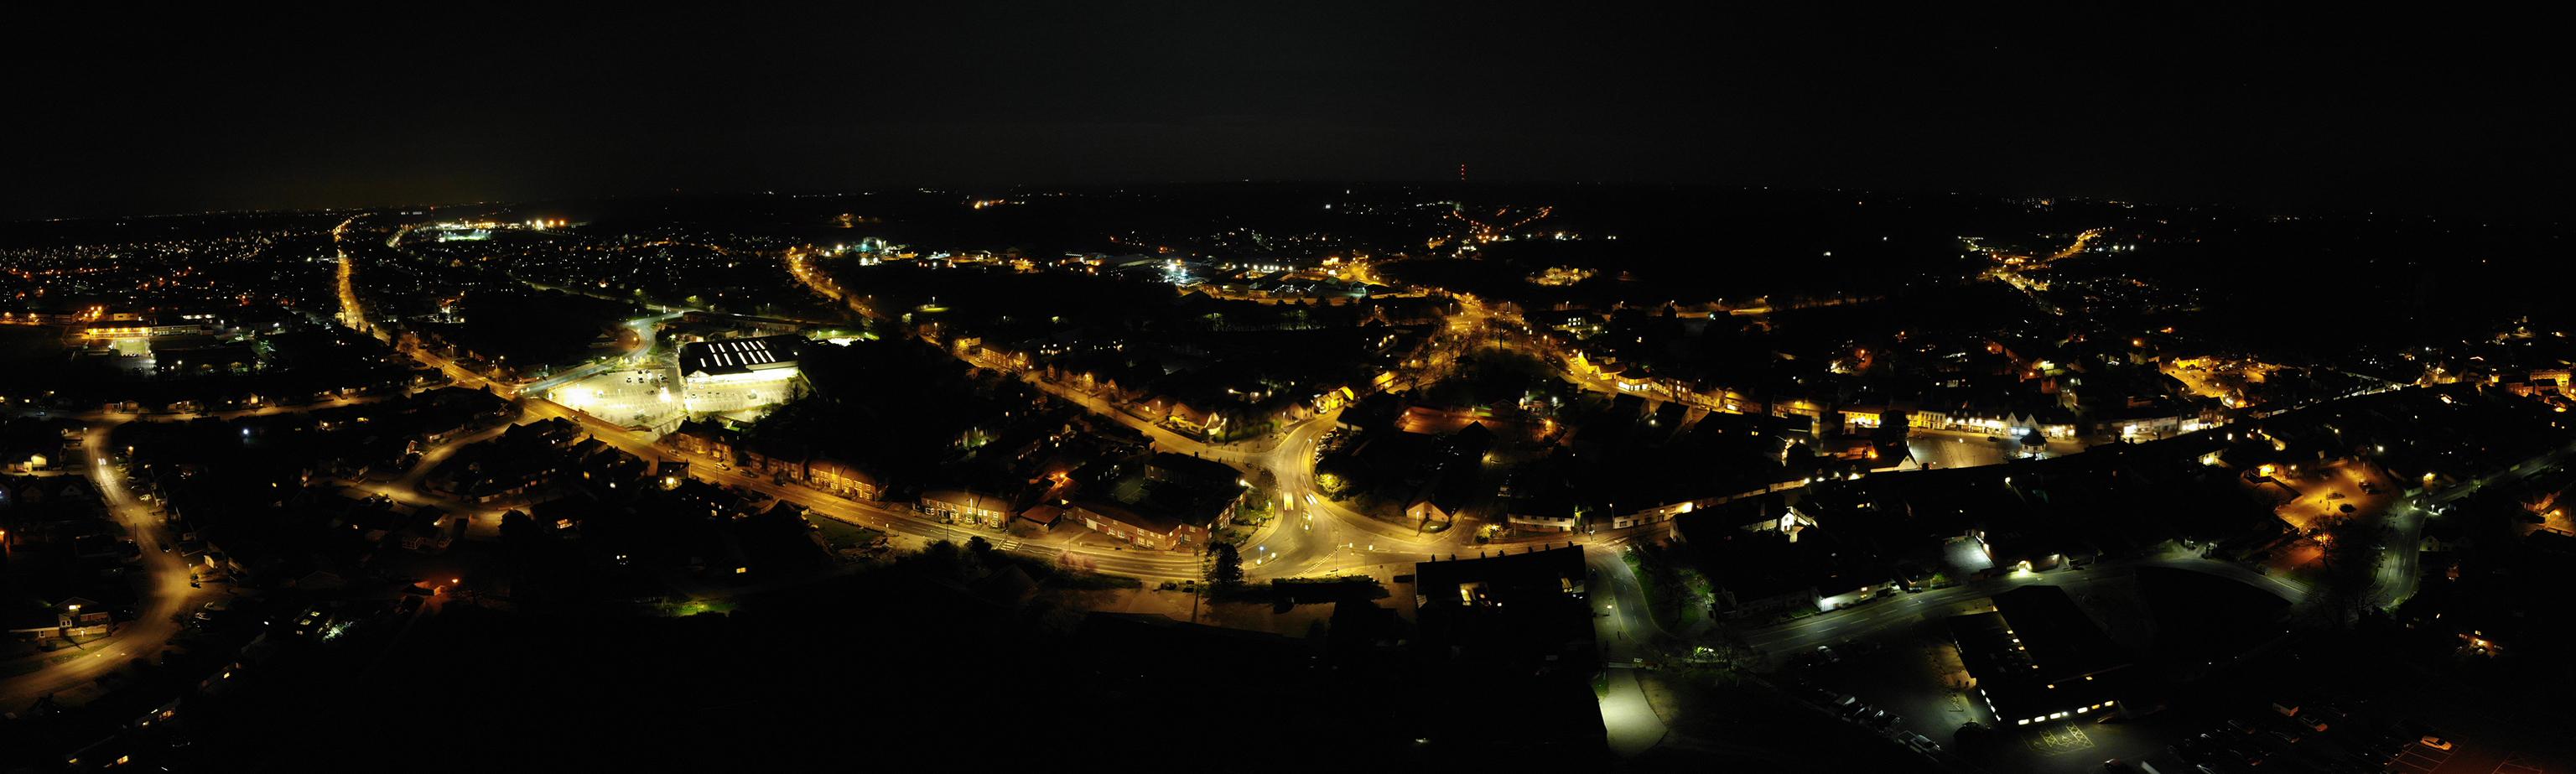 Wymondham at Night